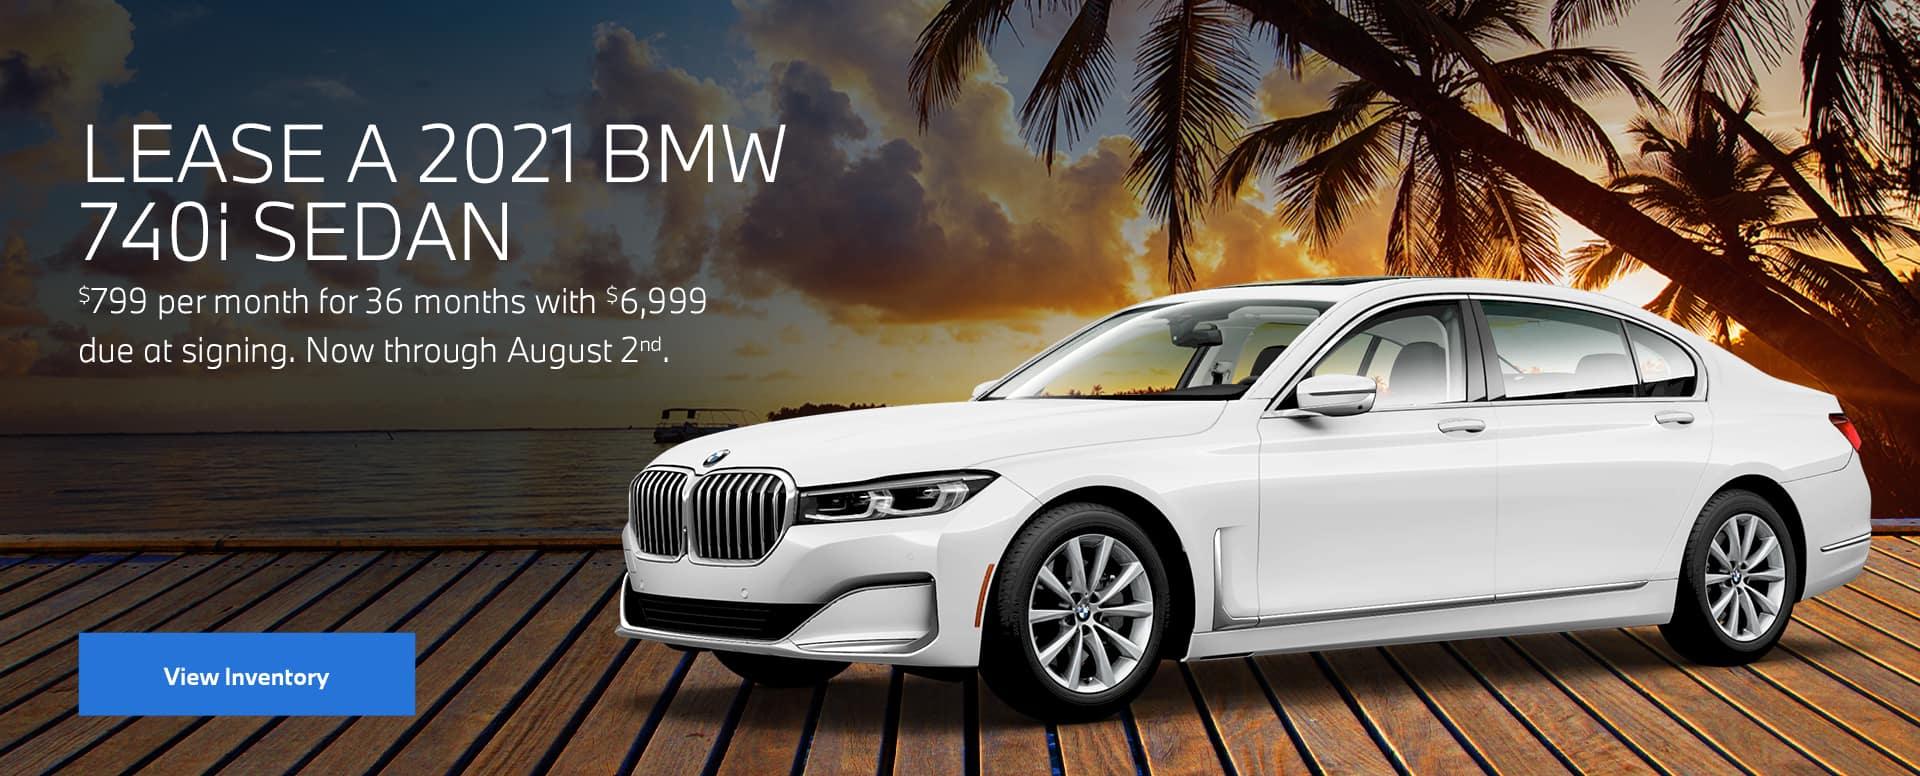 152-0721-VBC877_SL_BMW 740i_Desktop